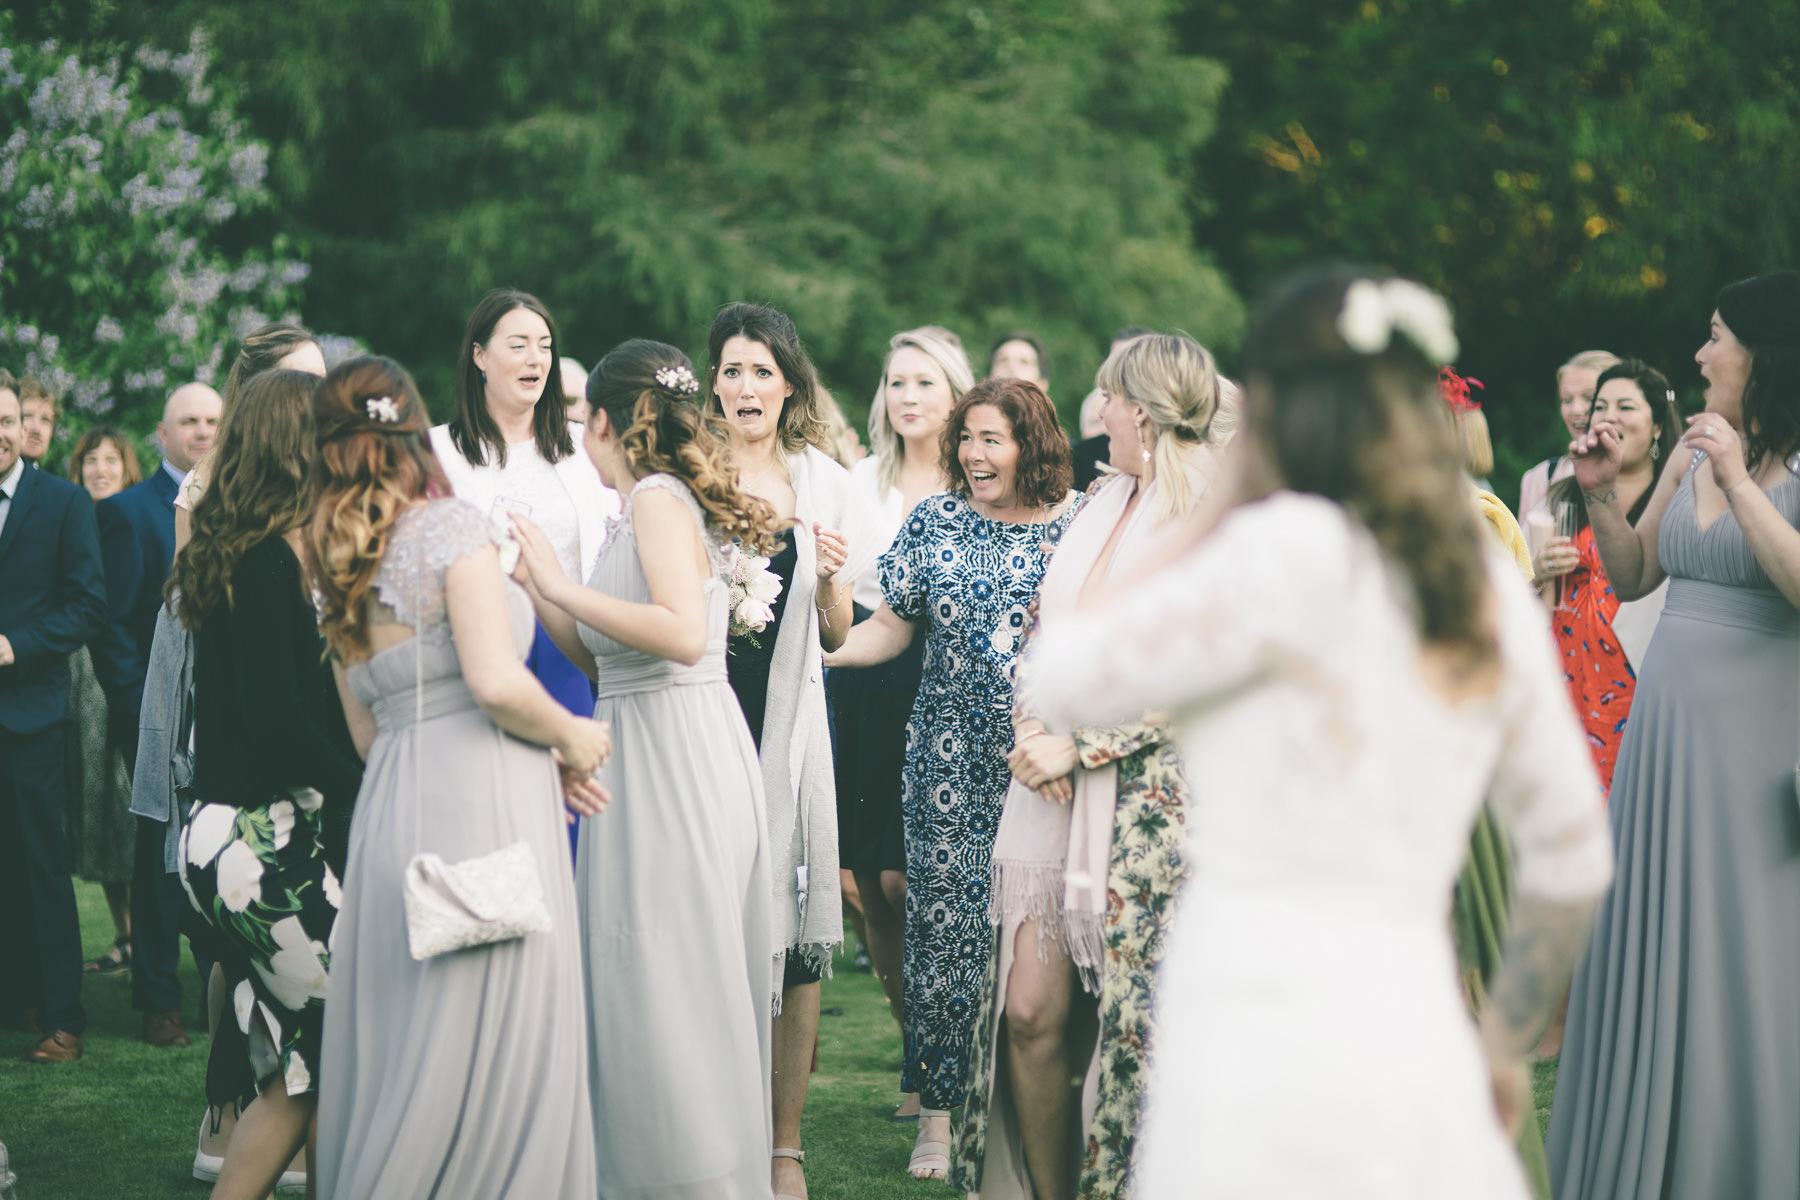 Pamber-Place-wedding-photography-basingstoke-hampshire-210